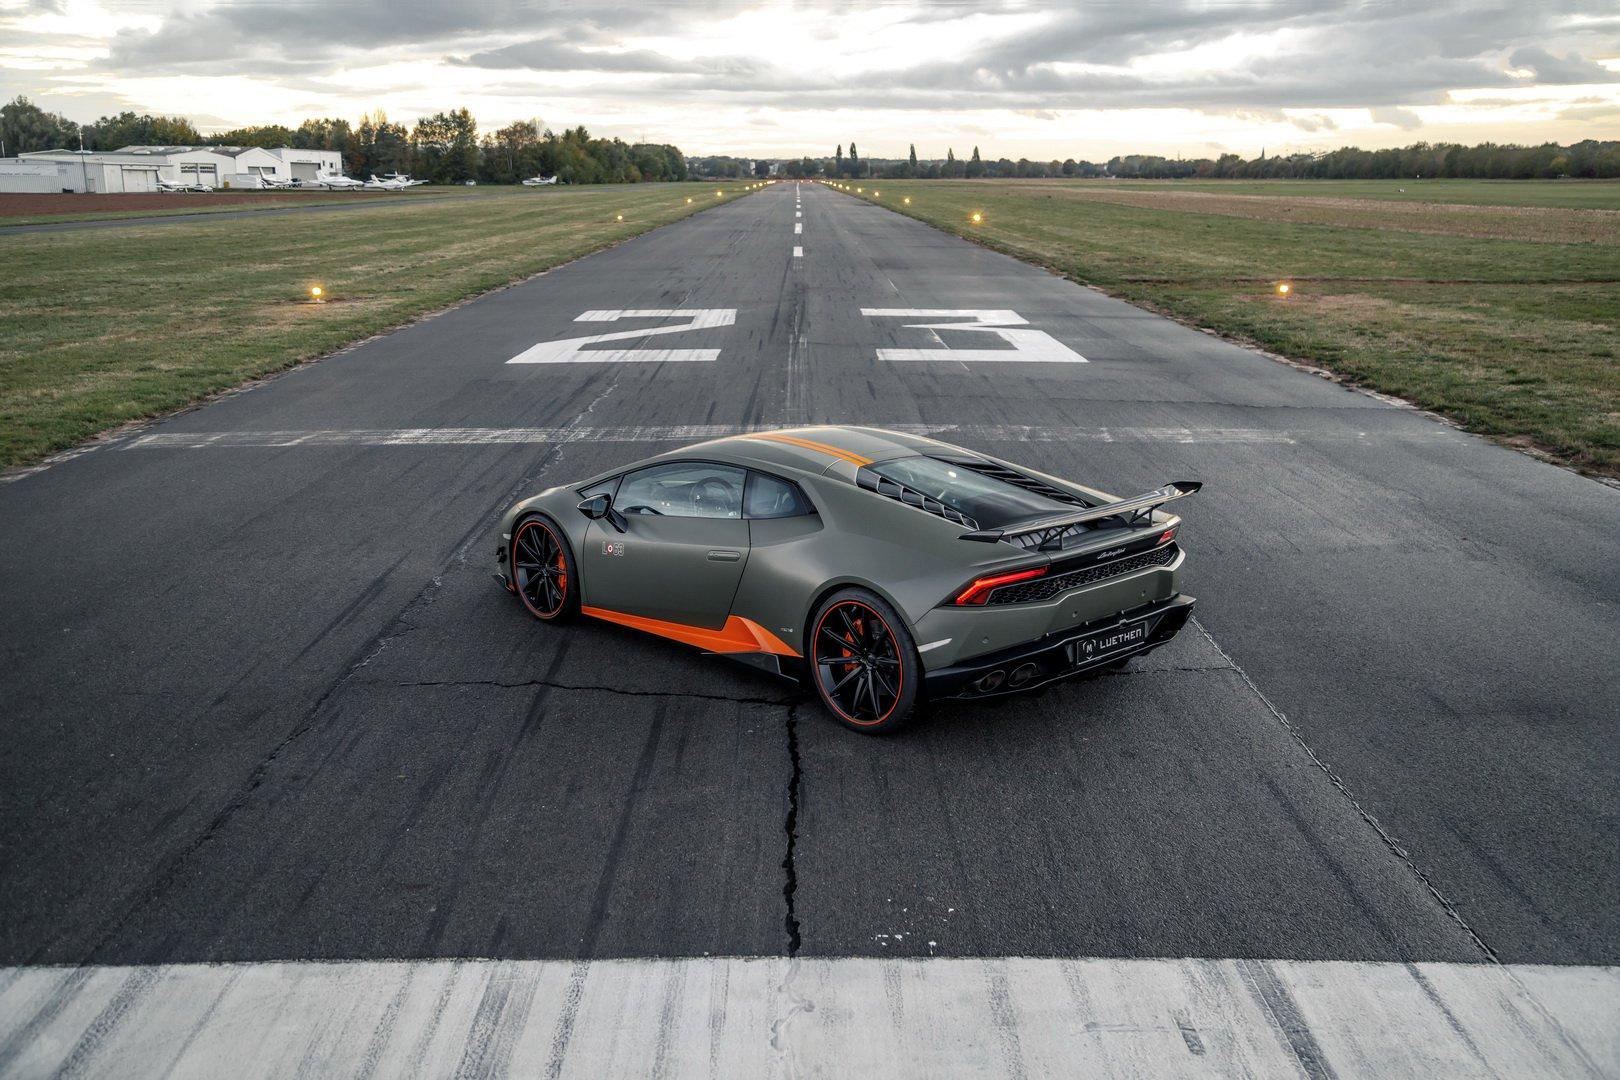 Lamborghini Huracan Avio by Luethen Motorsport (25)